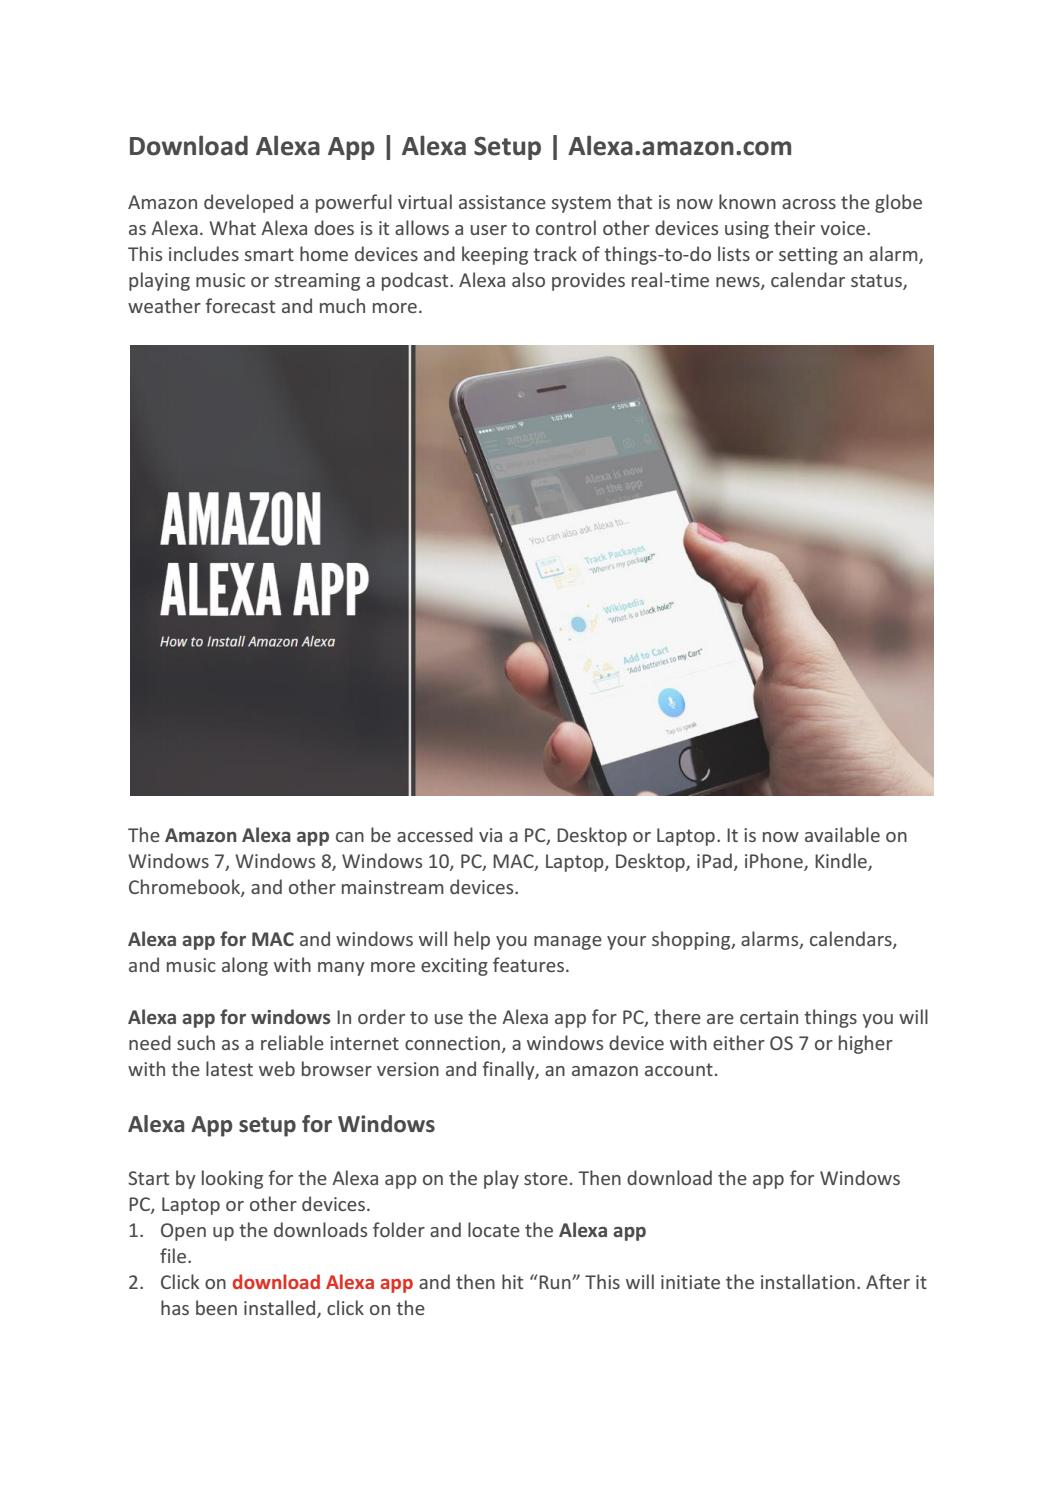 Pair Alexa To Mac